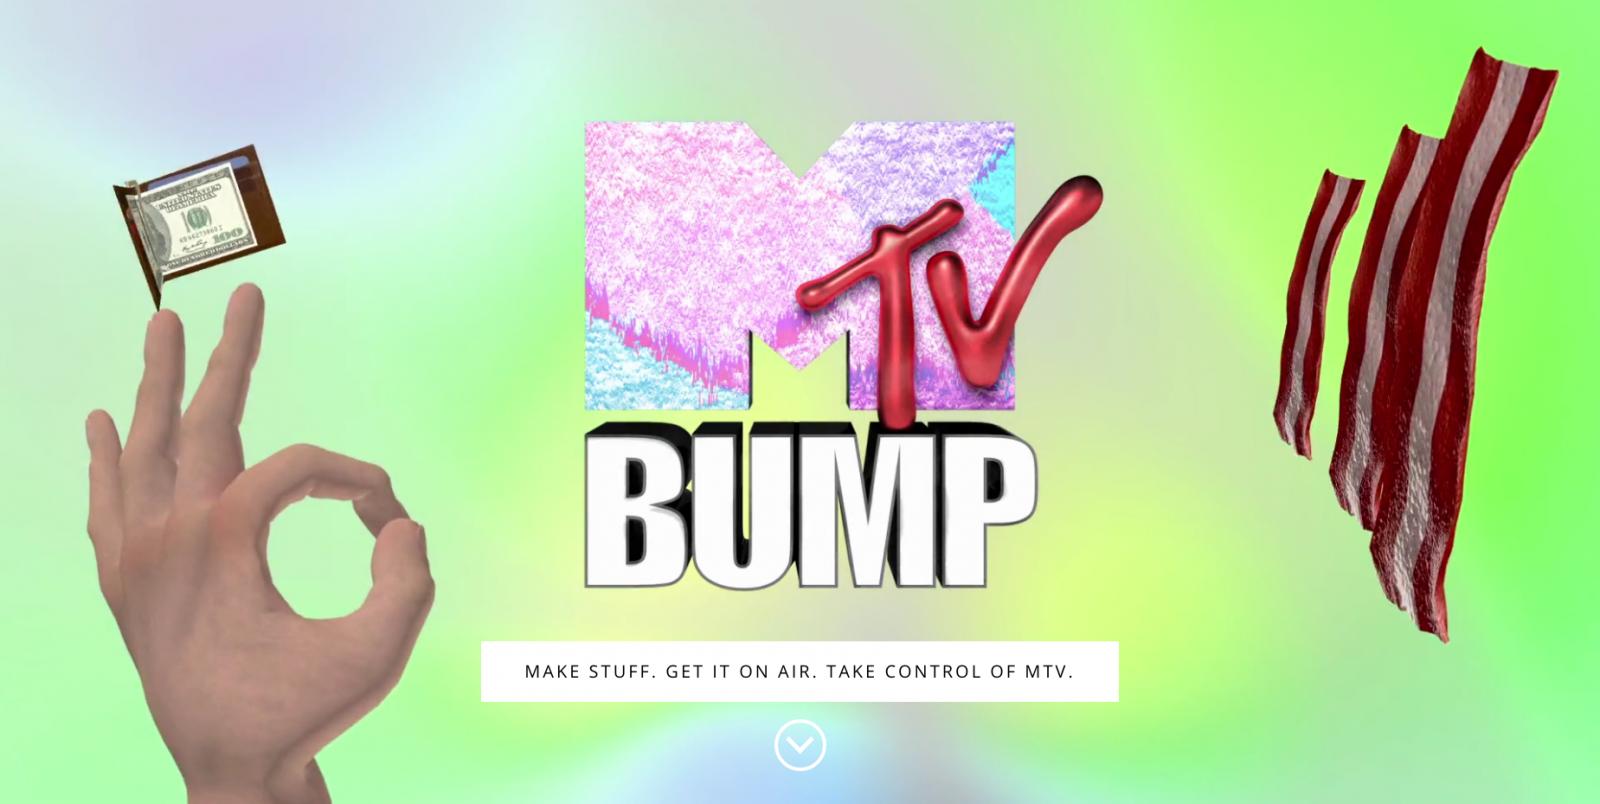 Richard Turley, MTV Bump